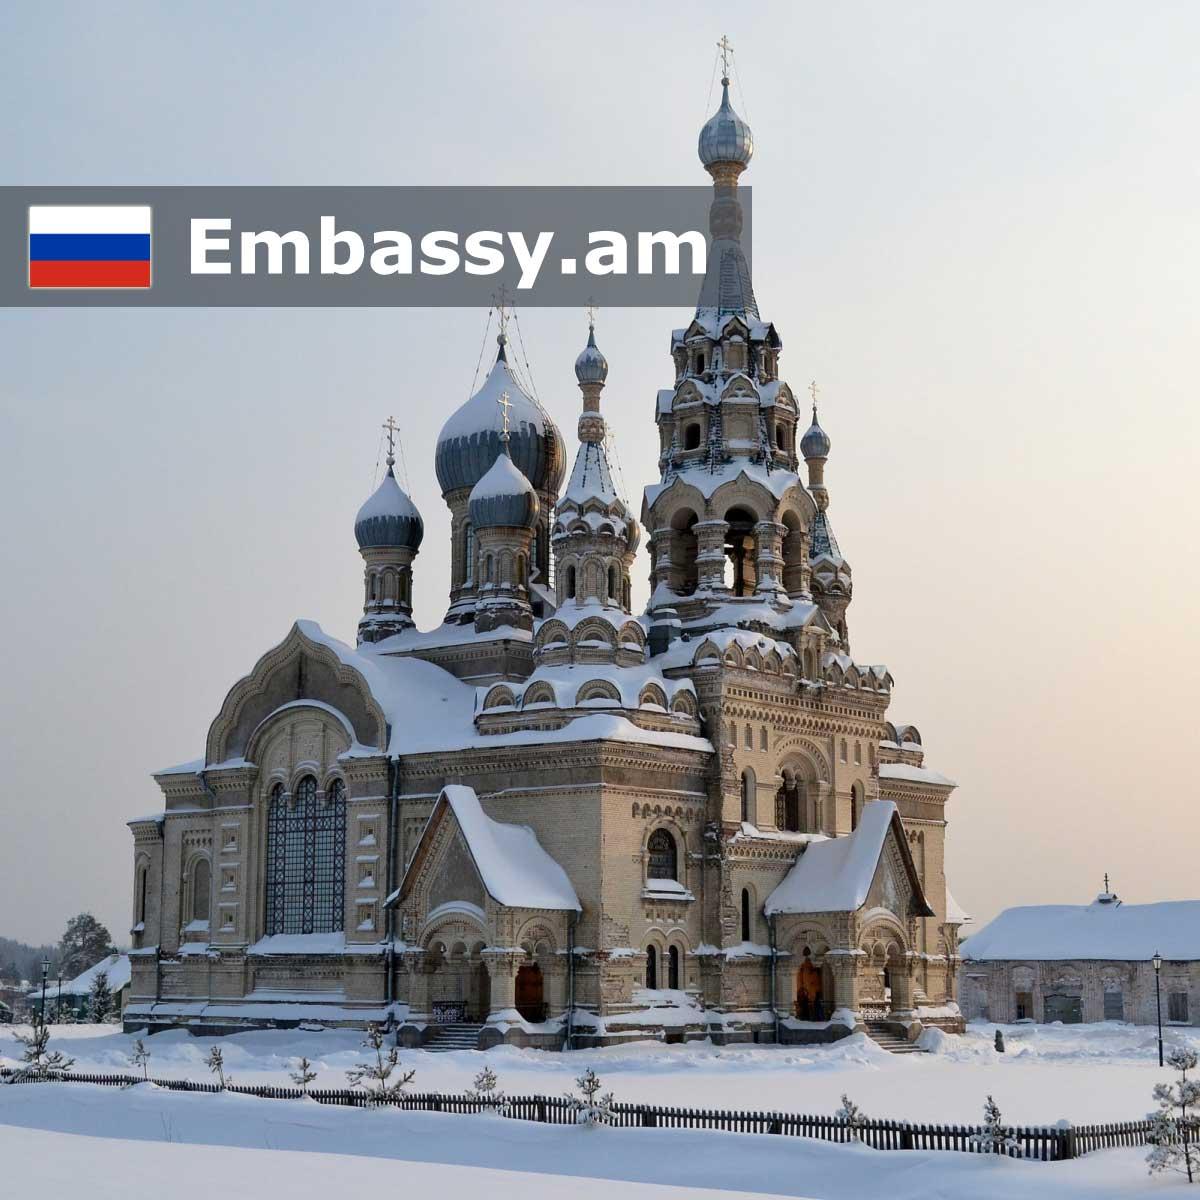 Yaroslavl - Hotels in Russia - Embassy.am